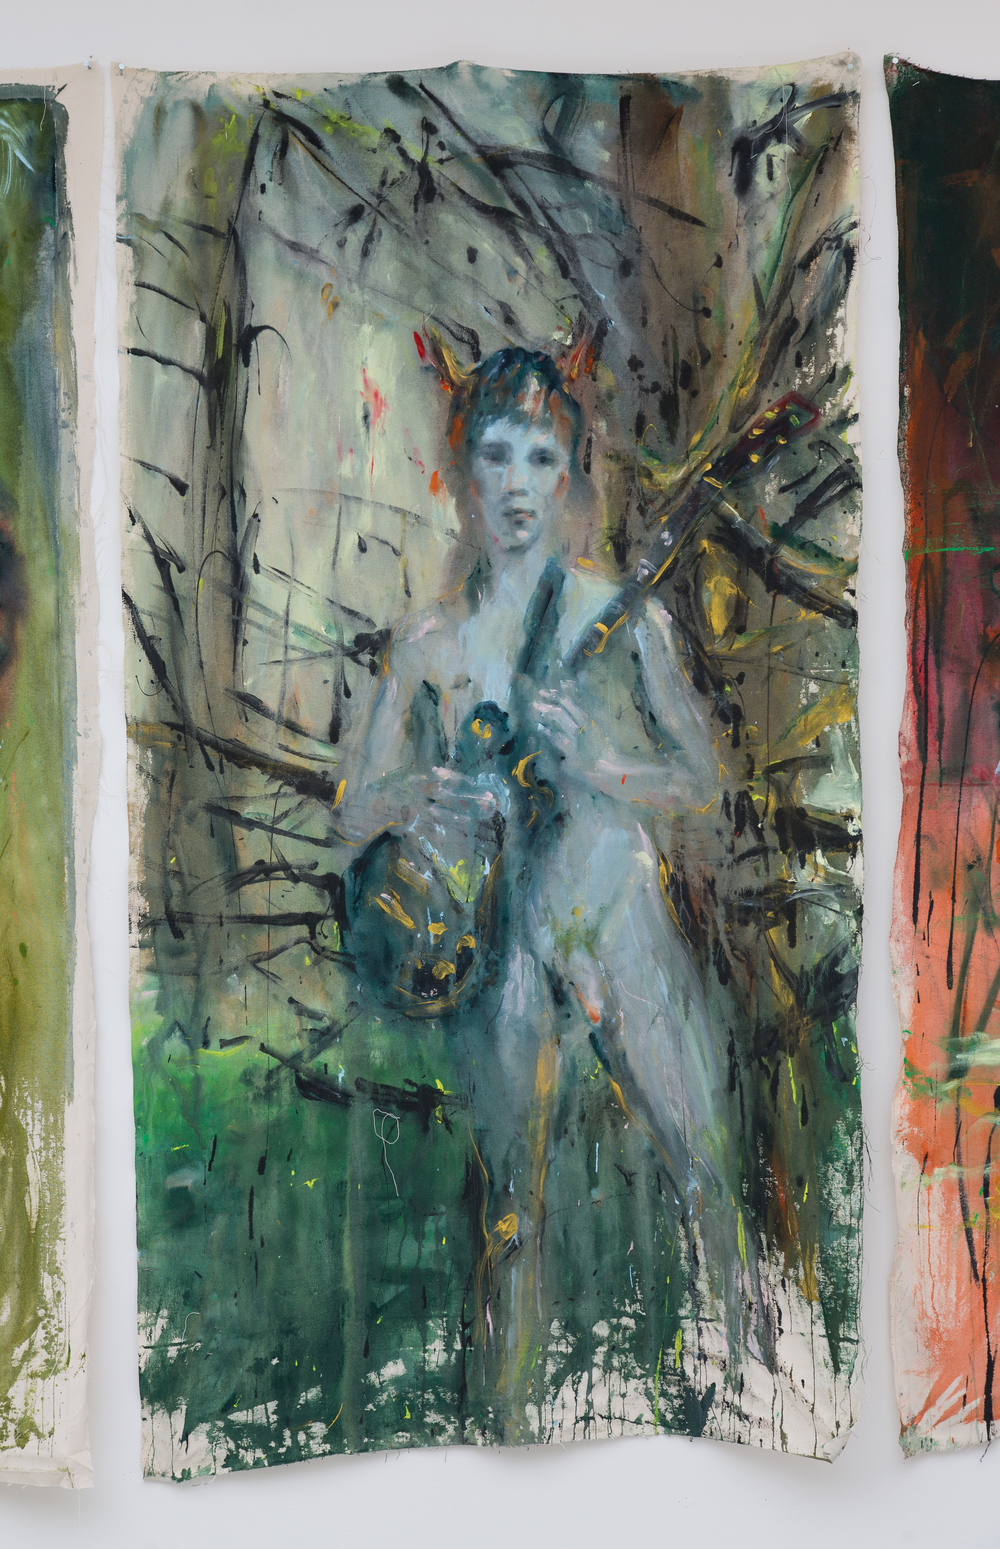 47. Andrej Dúbravský   bez názvu (giraeista v lese)   2013, akryl na plátně   200 x 100 cm